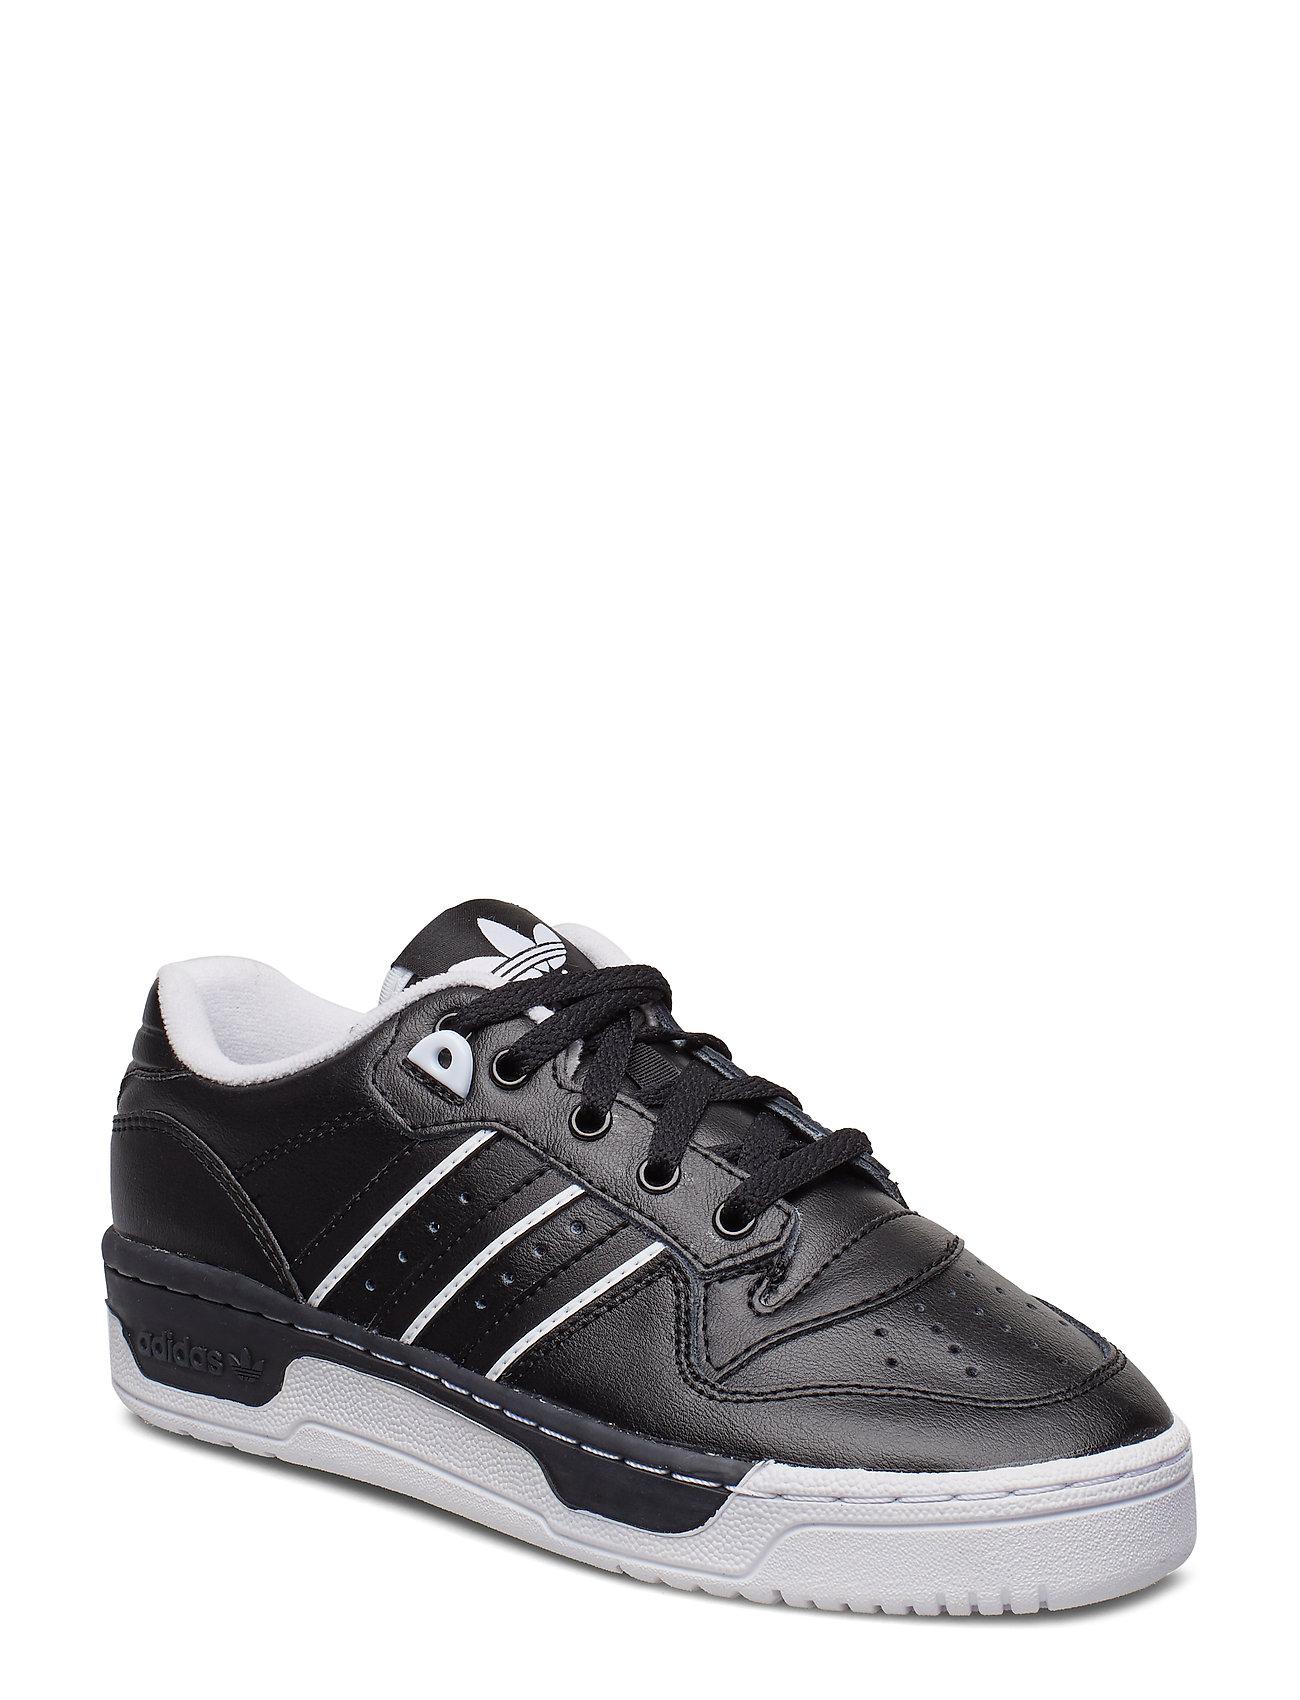 adidas Originals RIVALRY LOW J - CBLACK/CBLACK/FTWWHT